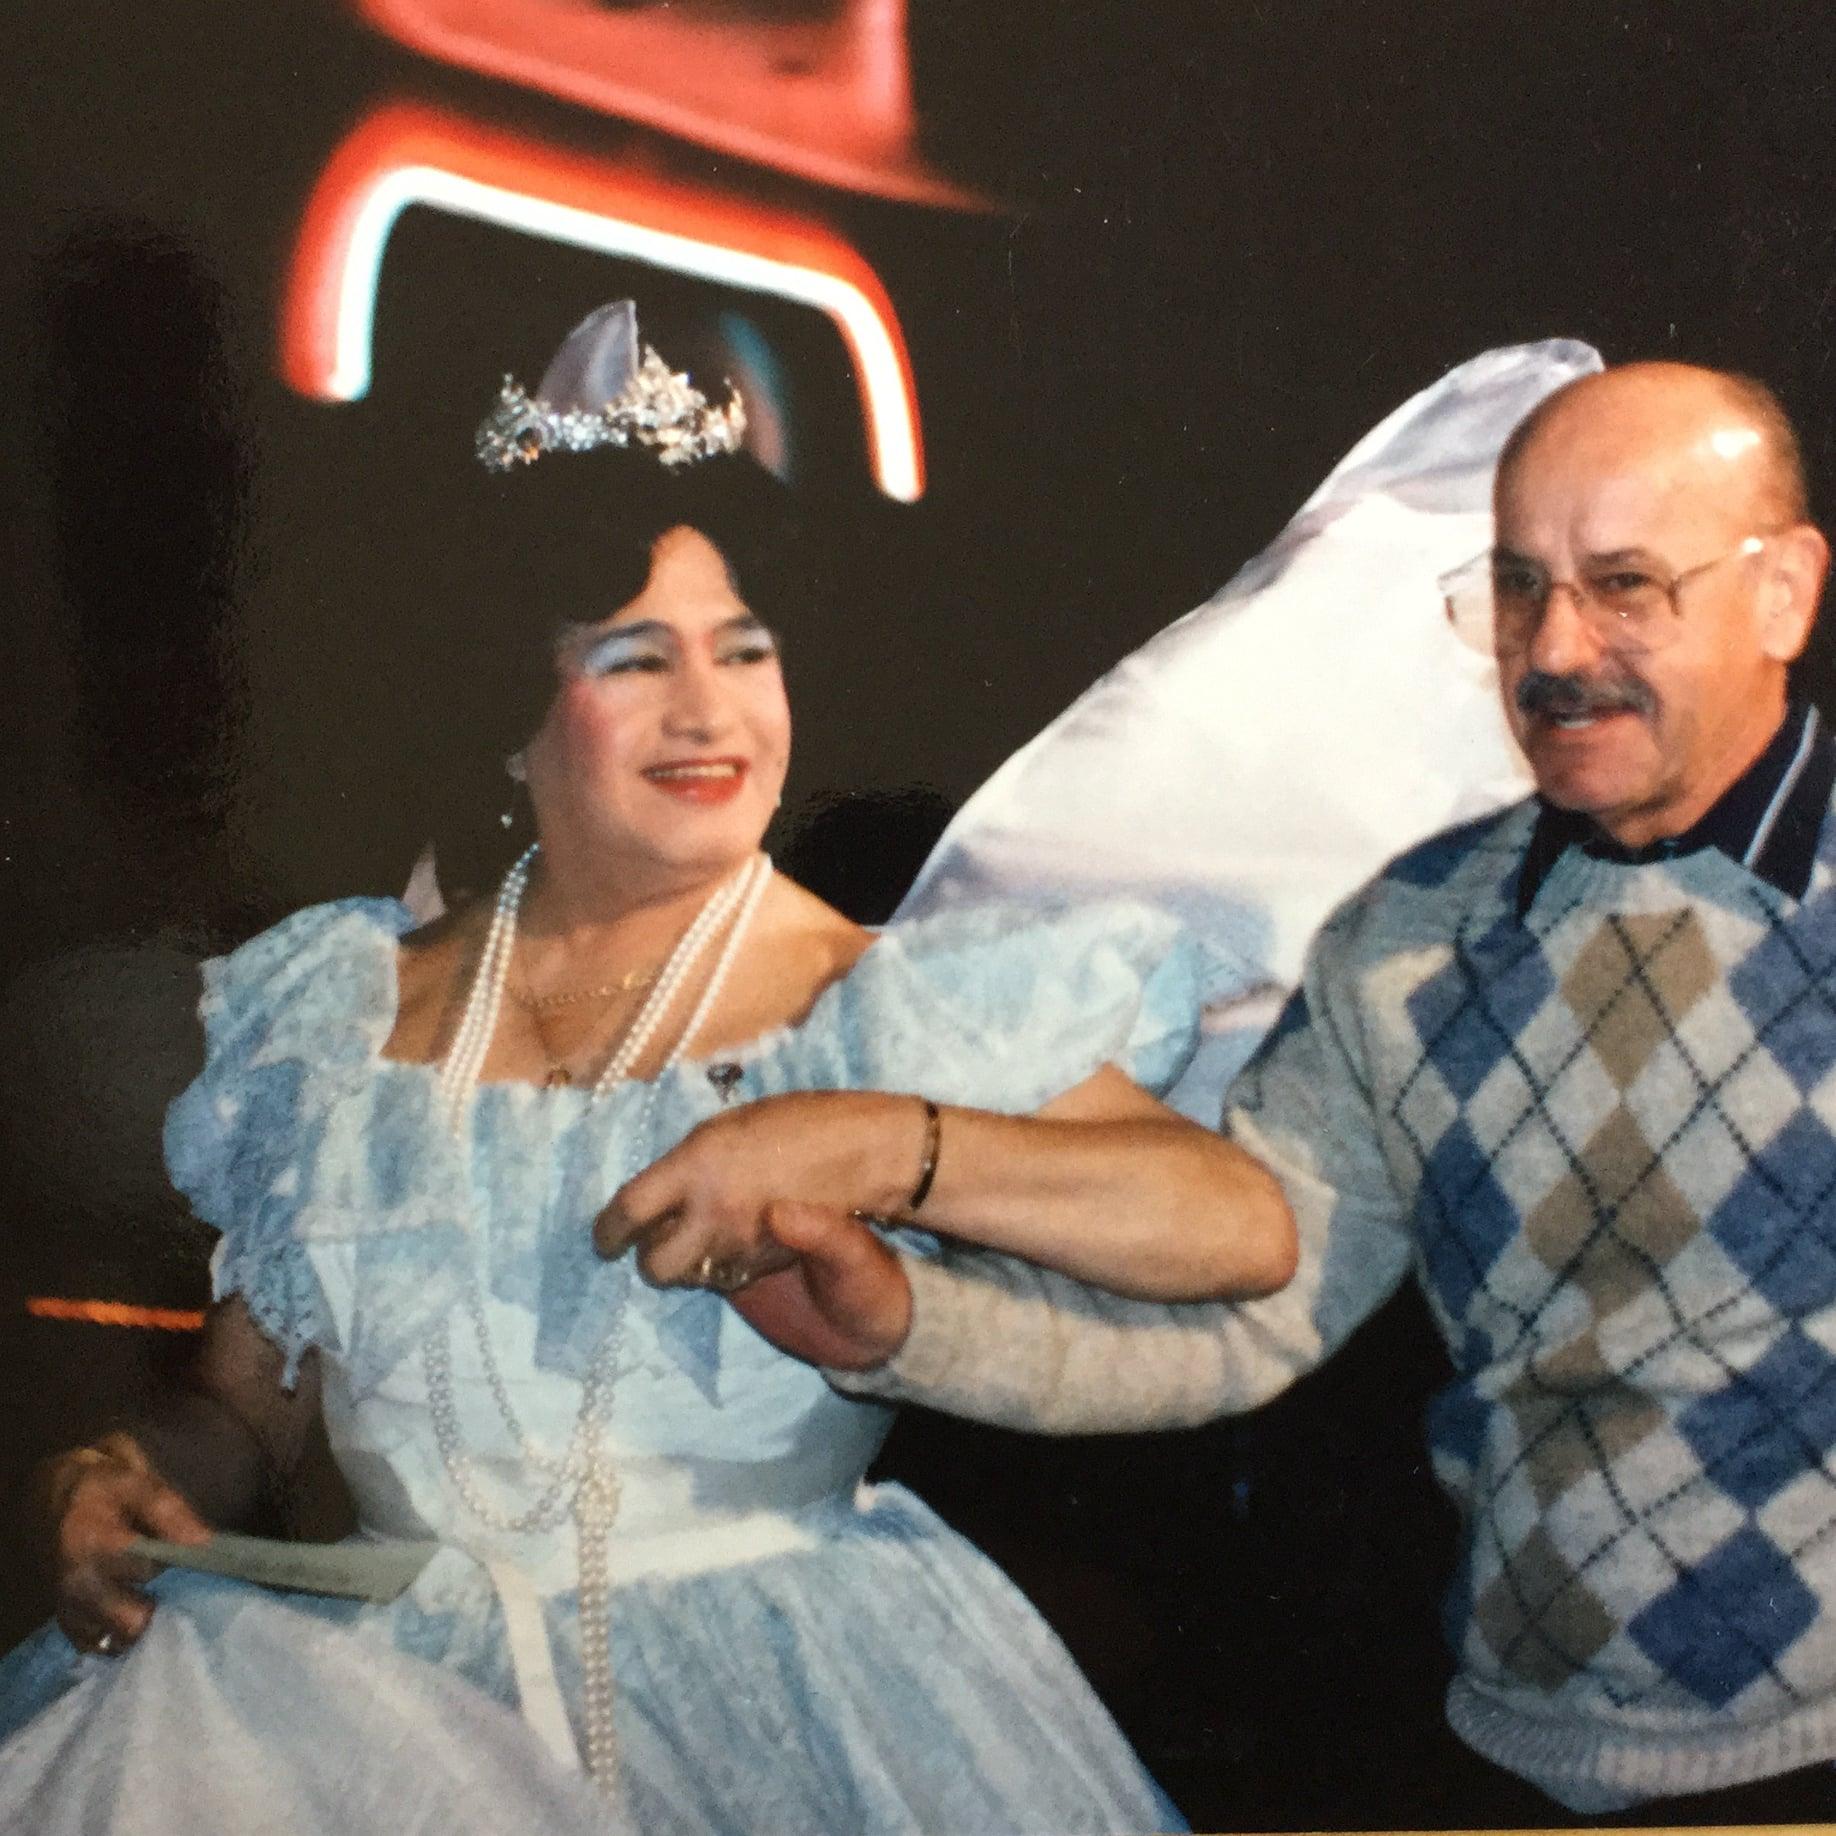 Jose as Sugar Plum Fairy at the first annual Dance Along Nutcracker in 1985